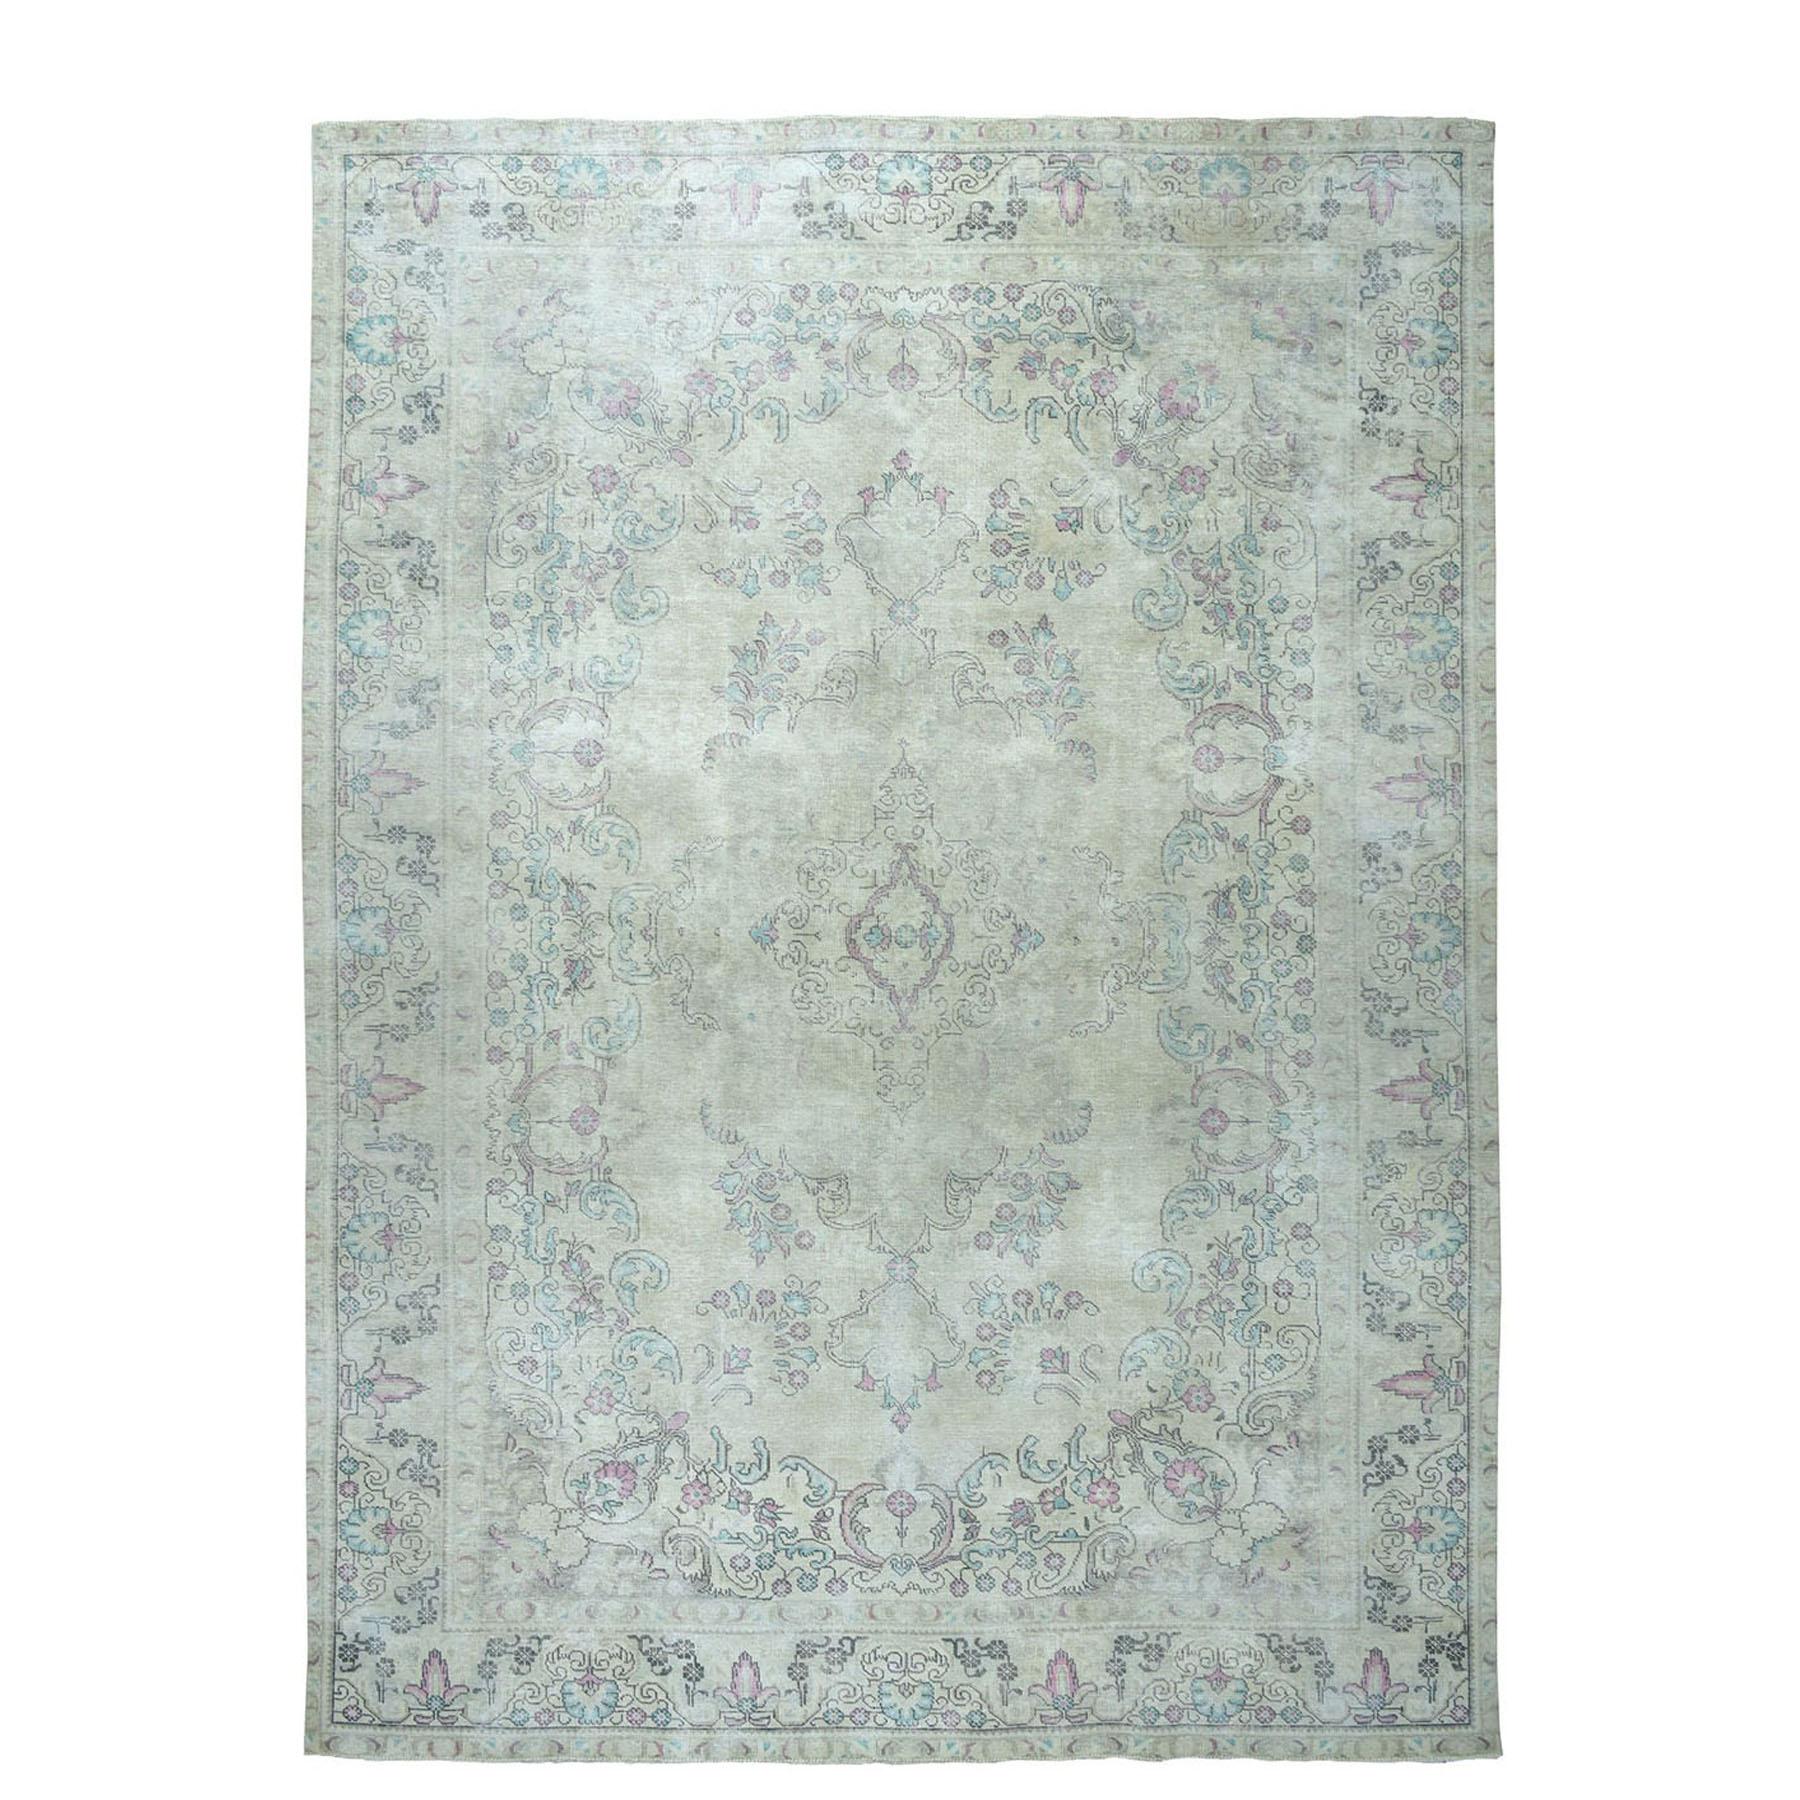 "9'4""x12'7"" Colorful Vintage Tabriz Worn Wool Hand-Knotted Oriental Rug"